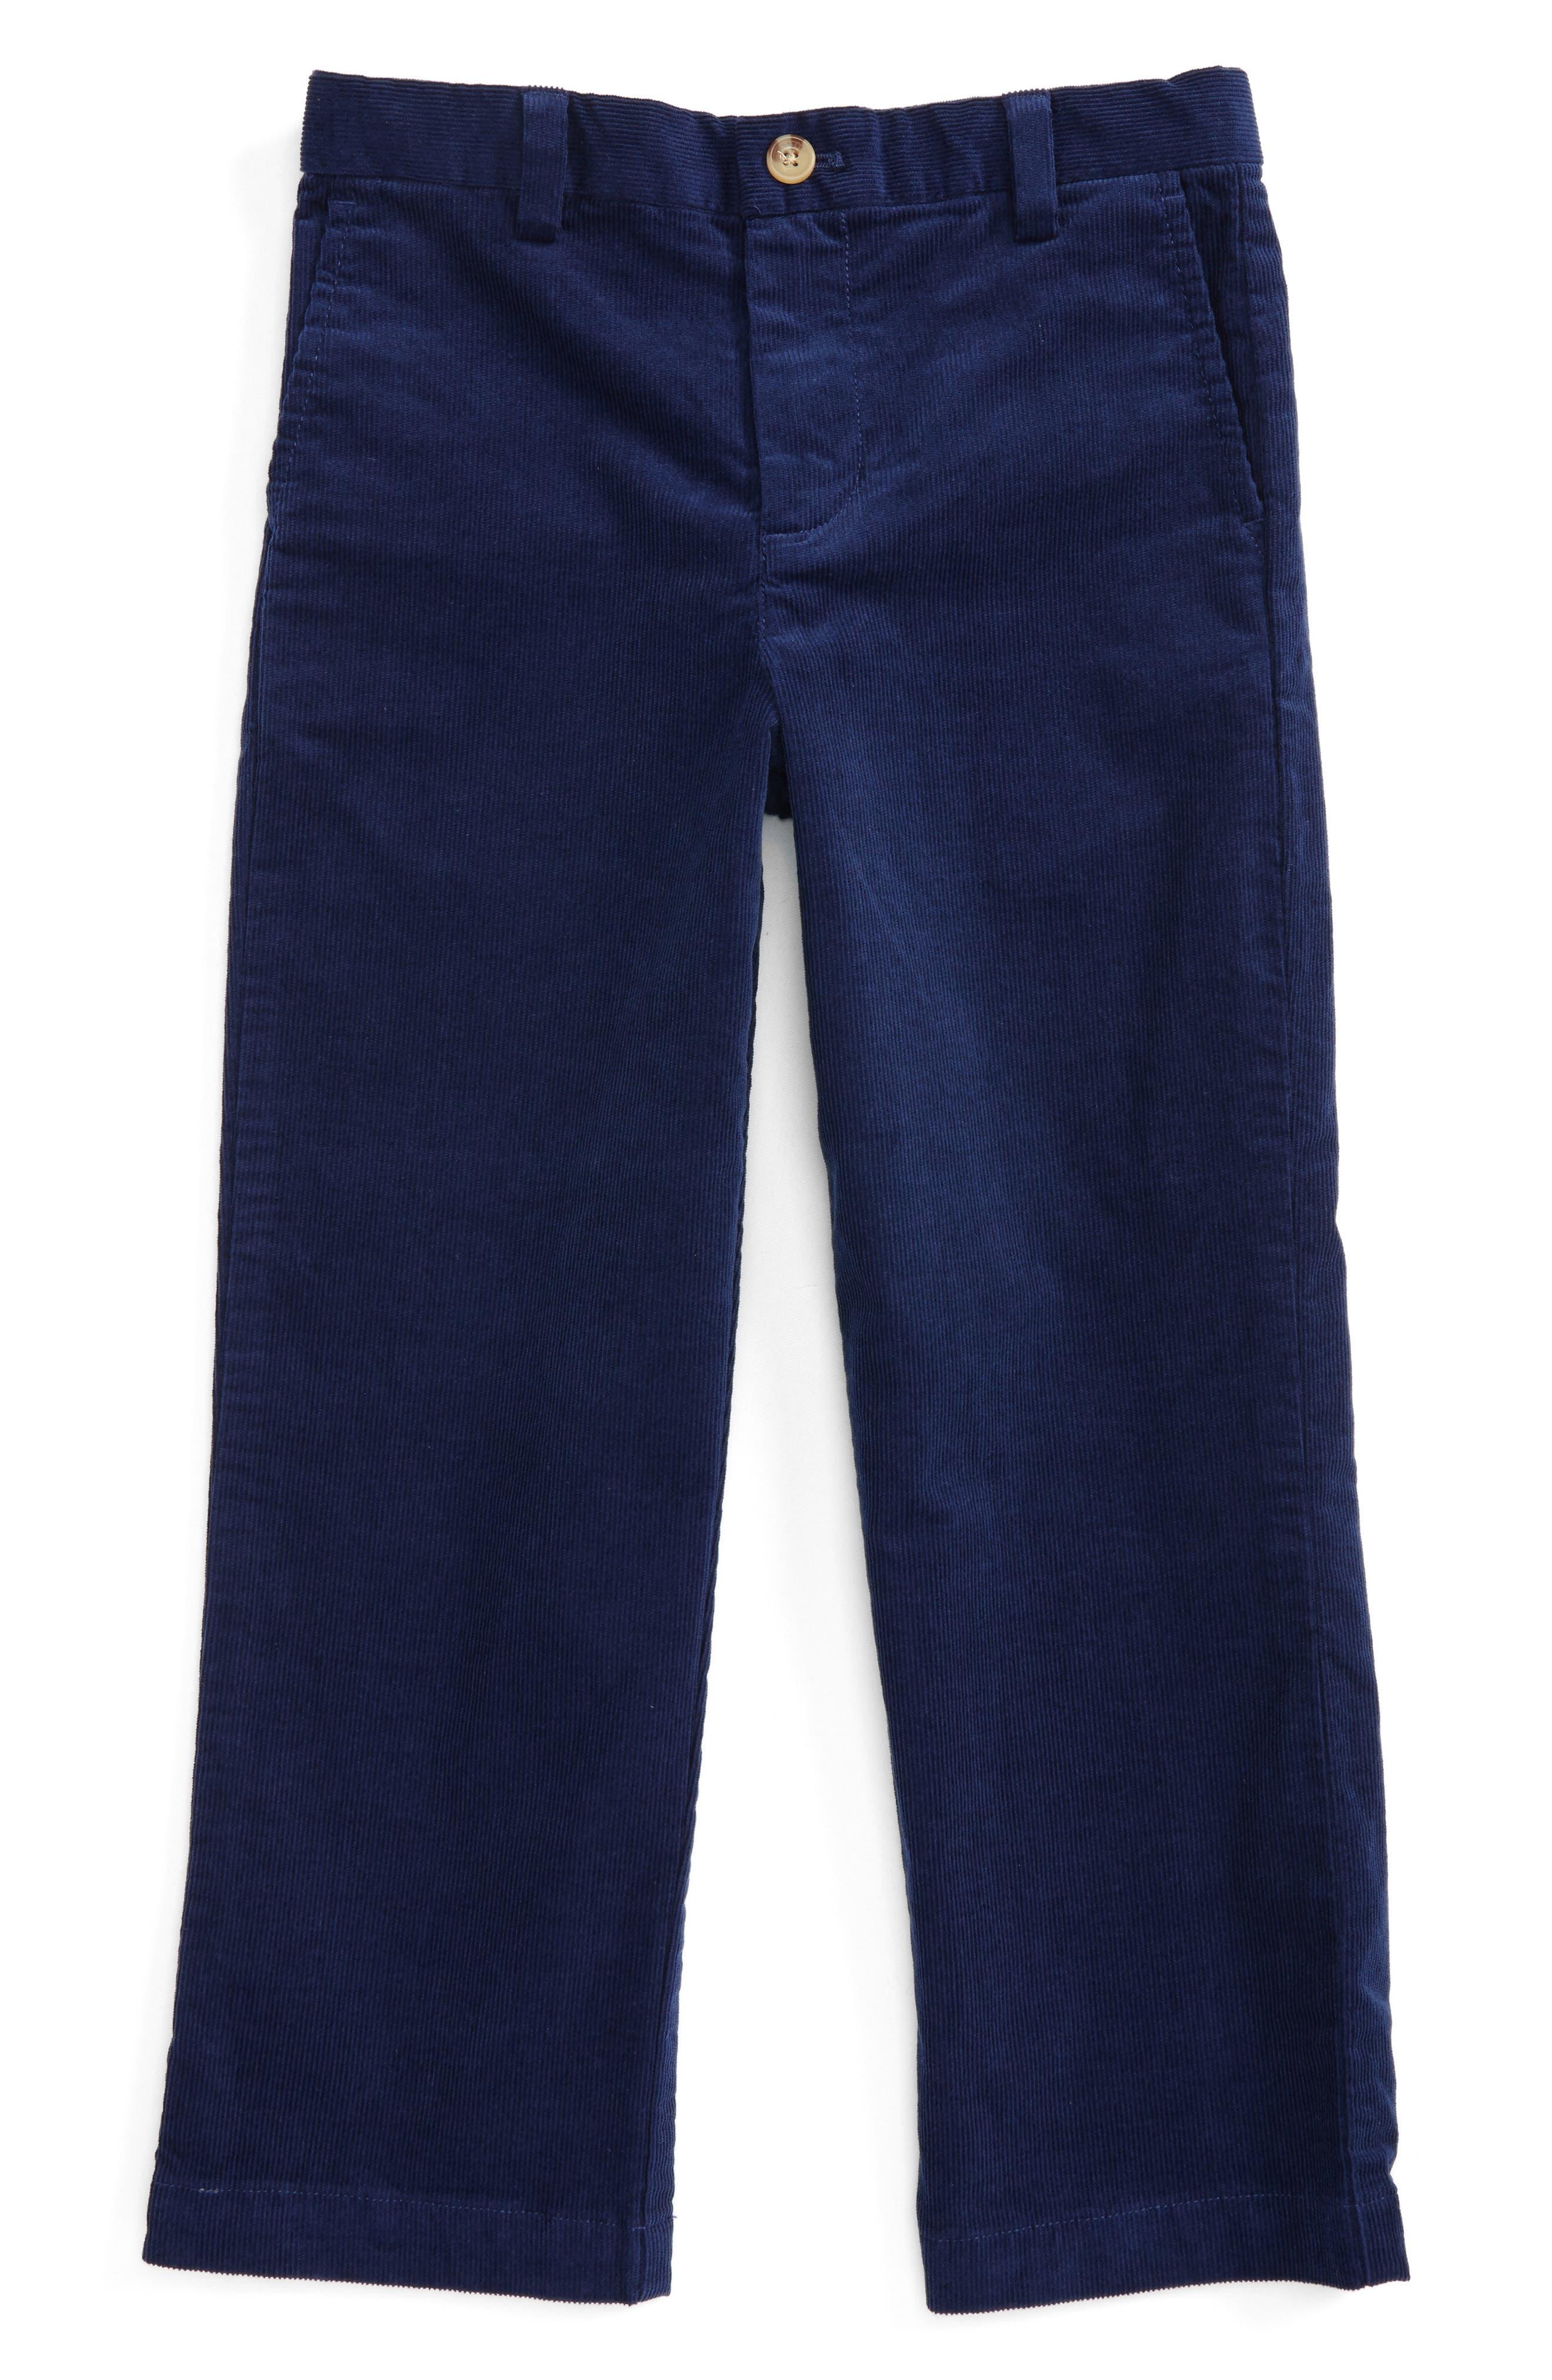 Breaker Corduroy Pants,                         Main,                         color, Deep Bay